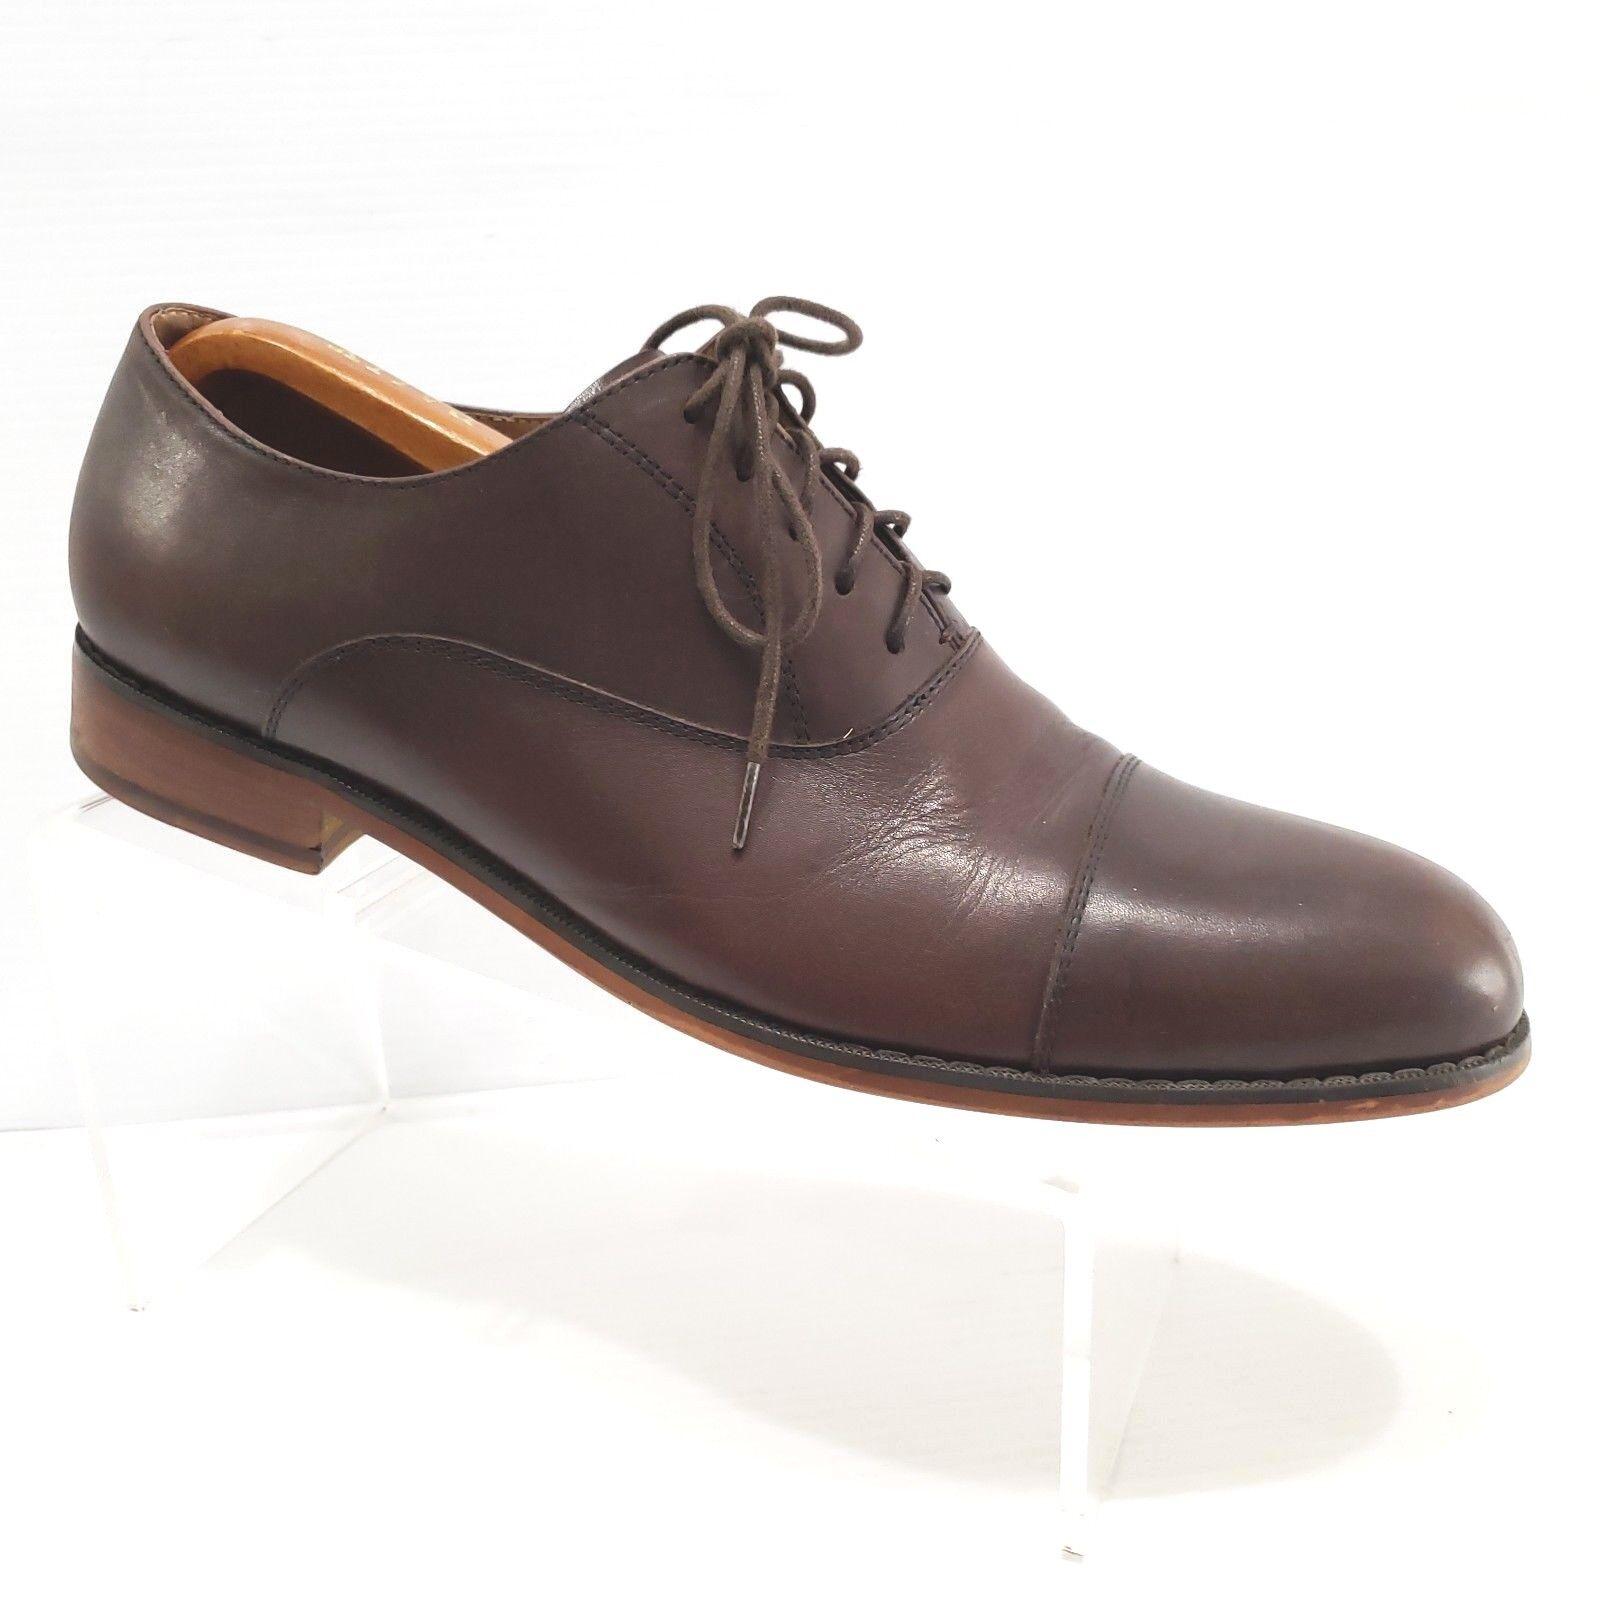 New Republic Mark McNairy Brown Cap Toe Dress Oxfords Size 11.5 Mens